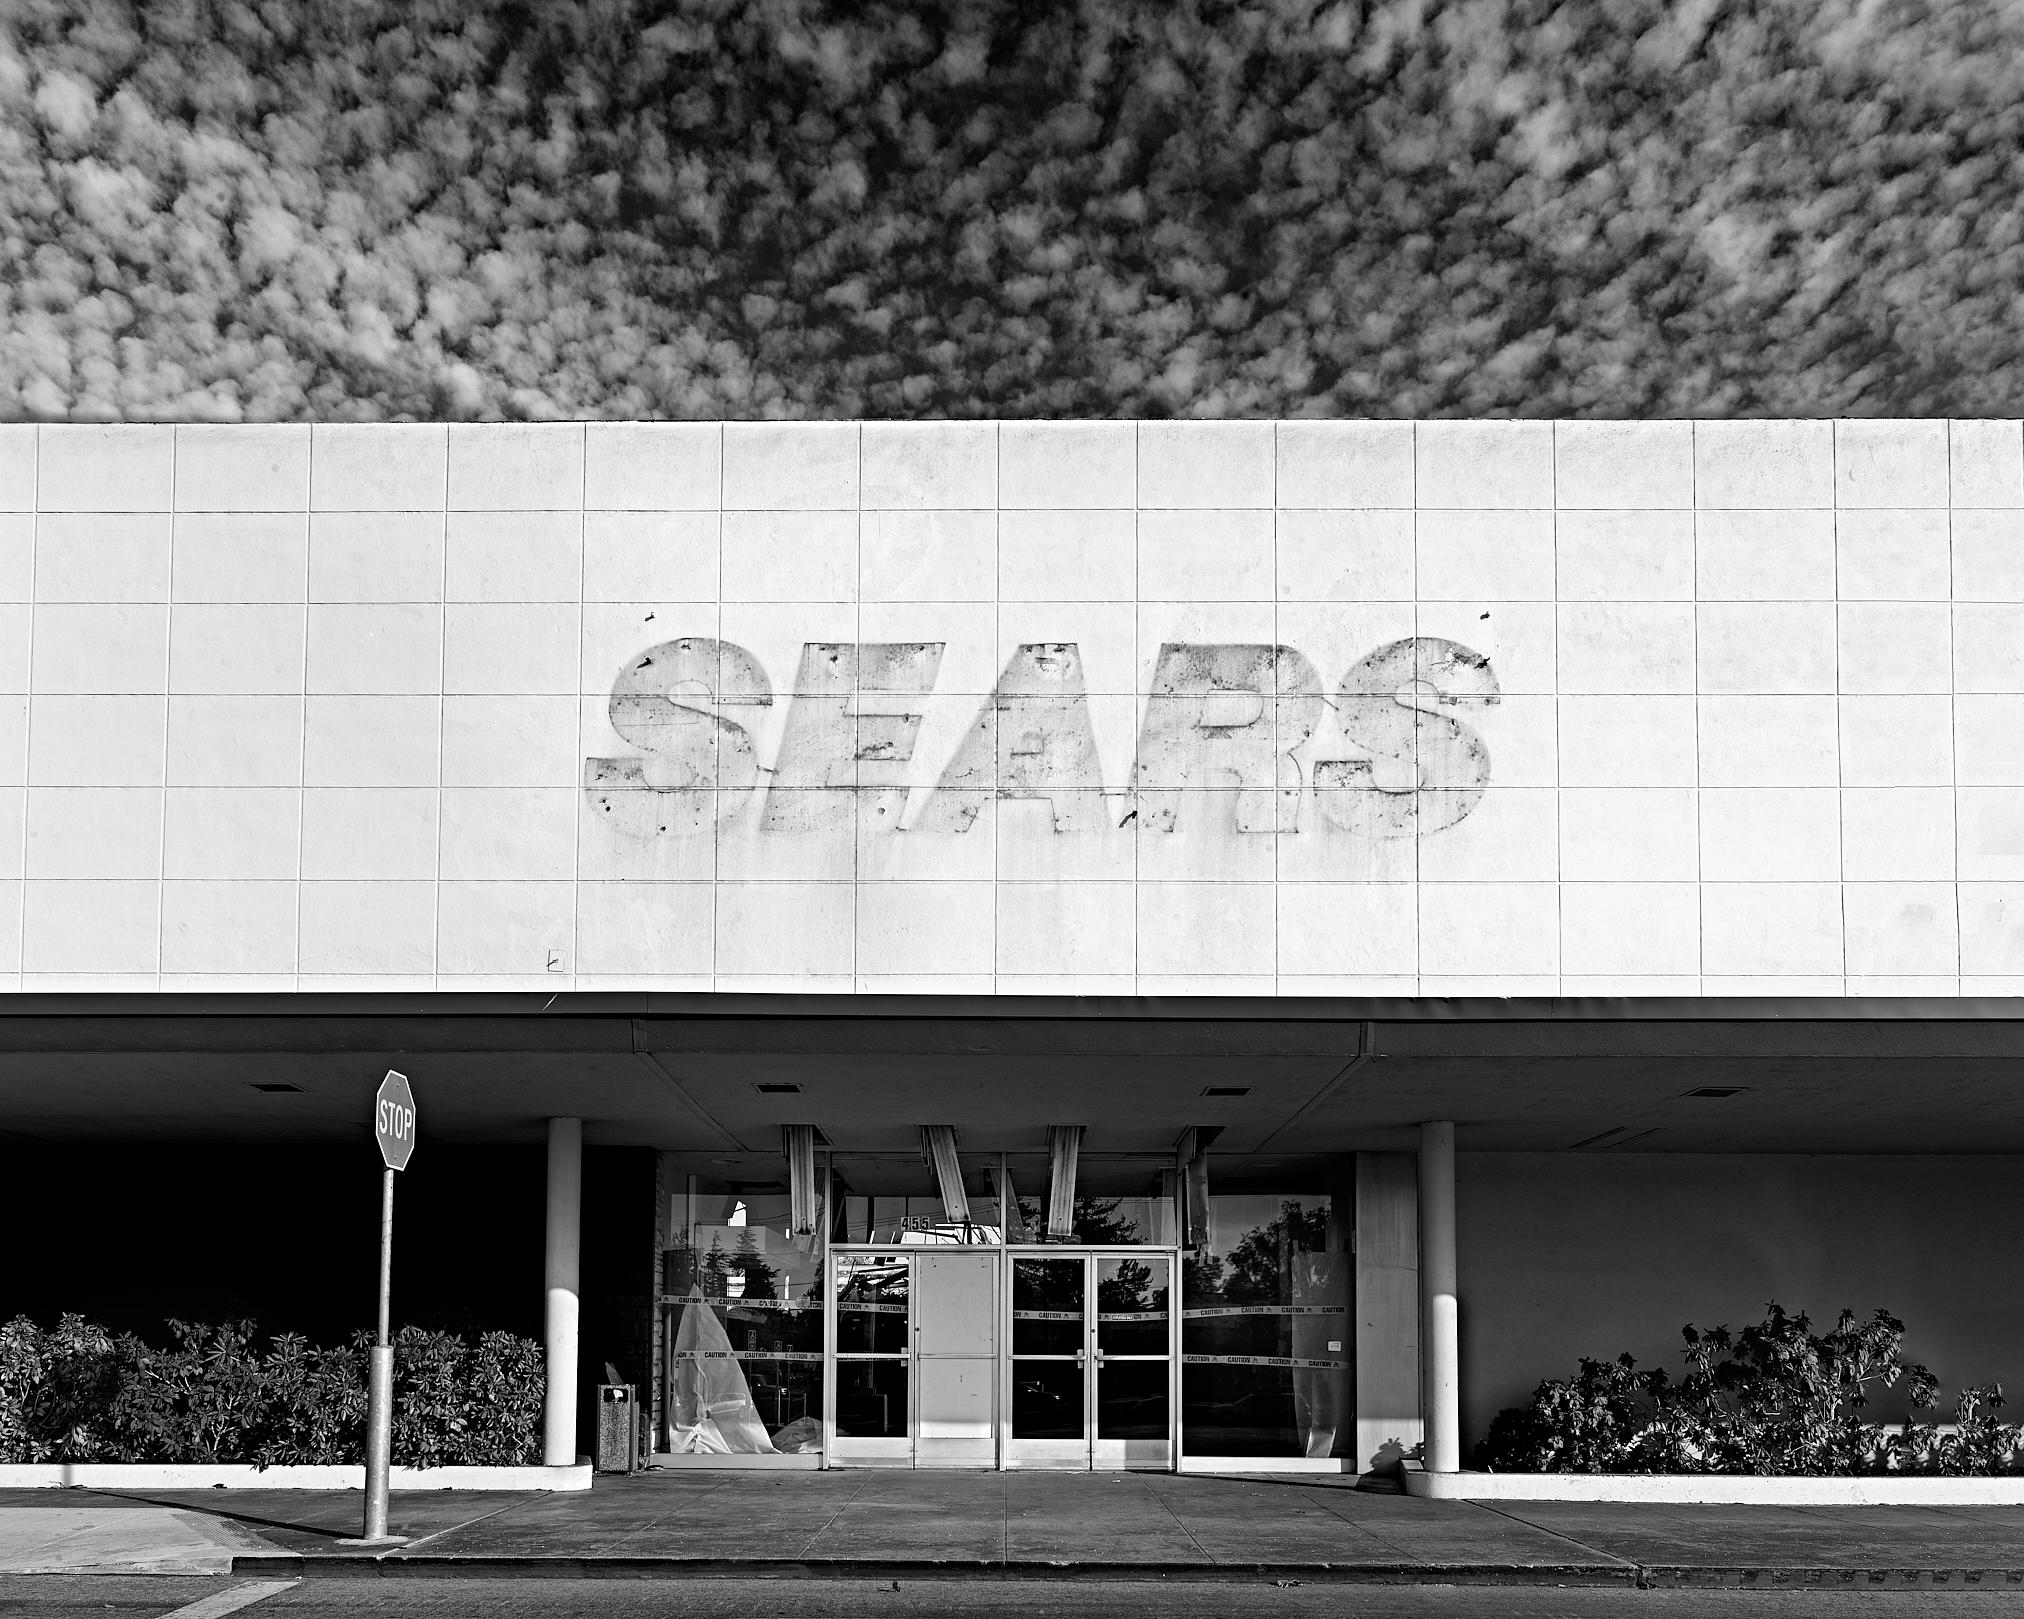 Sears Demolition by Peter Adams.